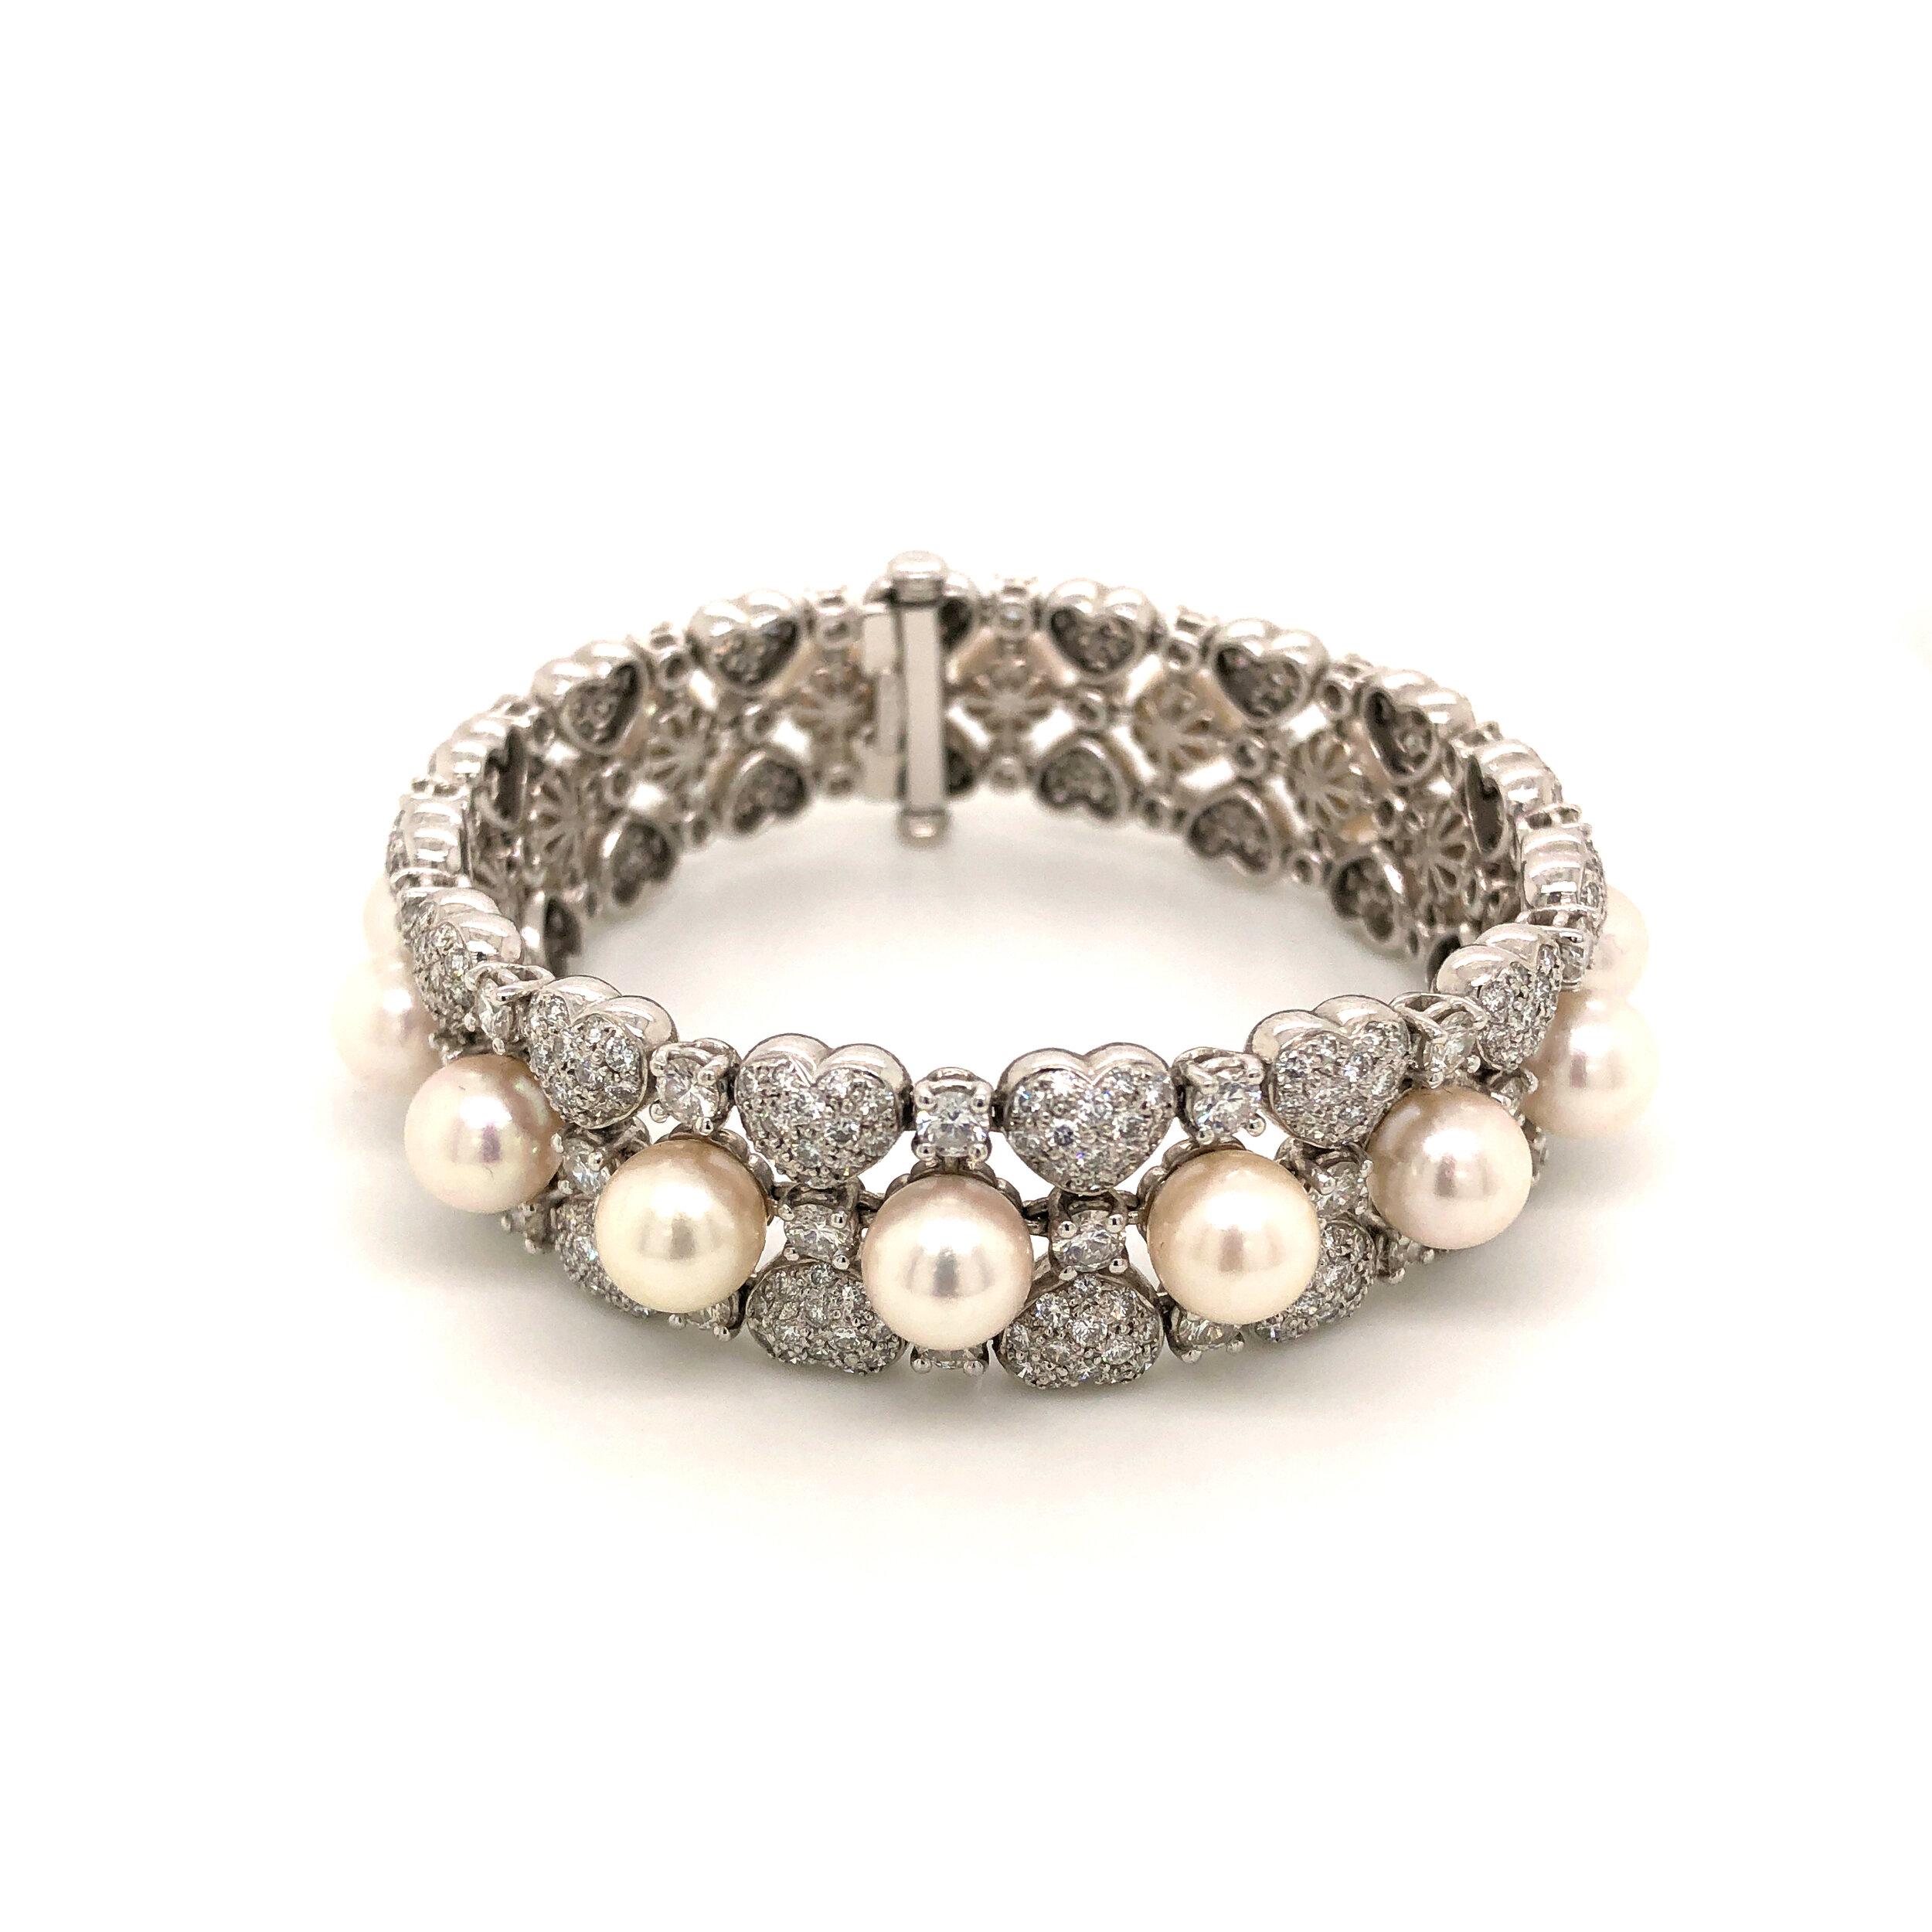 14ct Pave Diamond Heart Bracelet with Cultured Pearls Set in 18 Karat Gold  Est. US$ 4,500-6,500